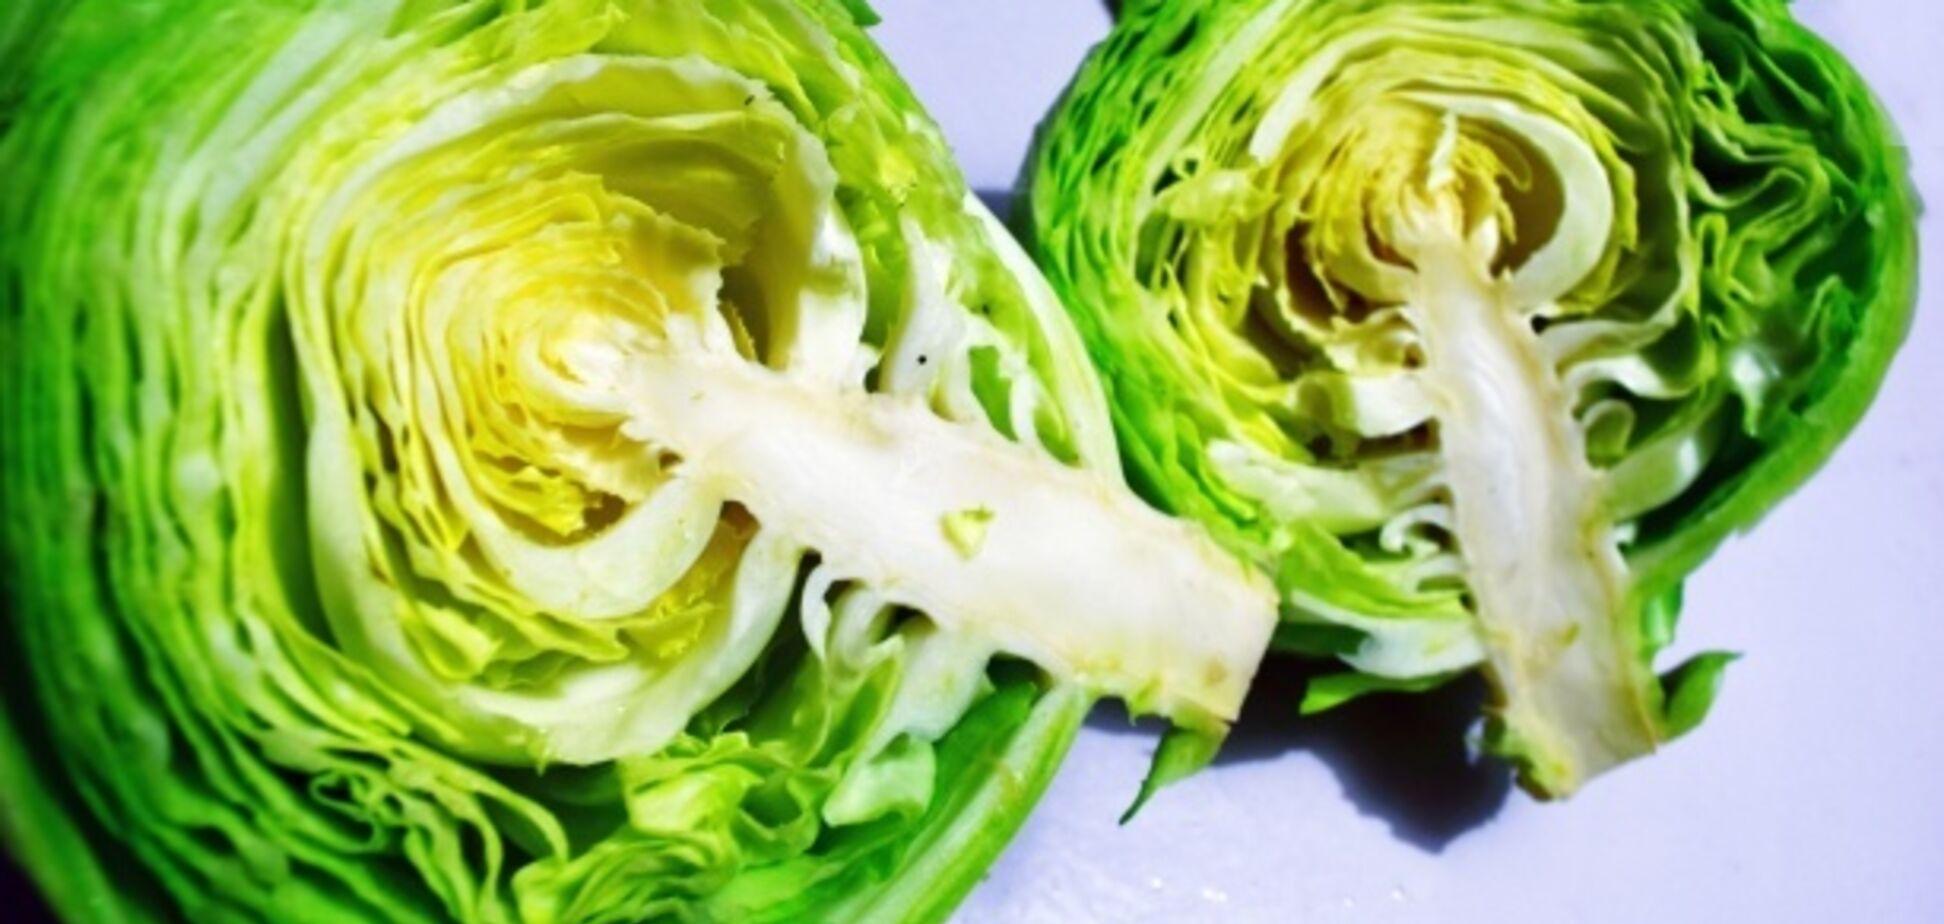 Рецепт дивовижного блюда з капусти